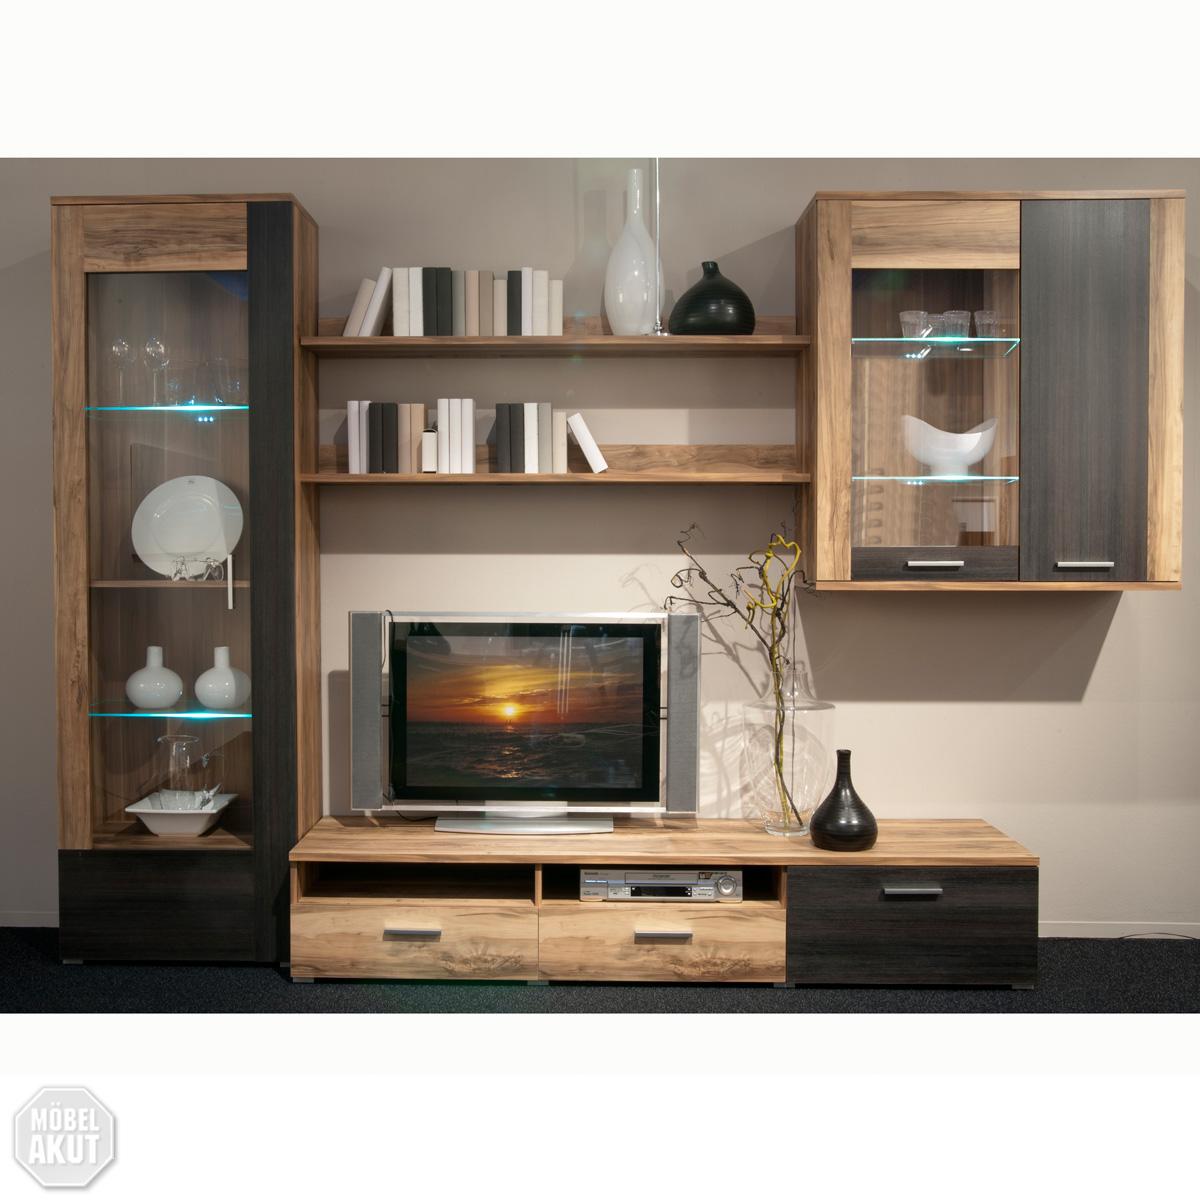 wohnwand kandy anbauwand nussbaum touchwood led ebay. Black Bedroom Furniture Sets. Home Design Ideas